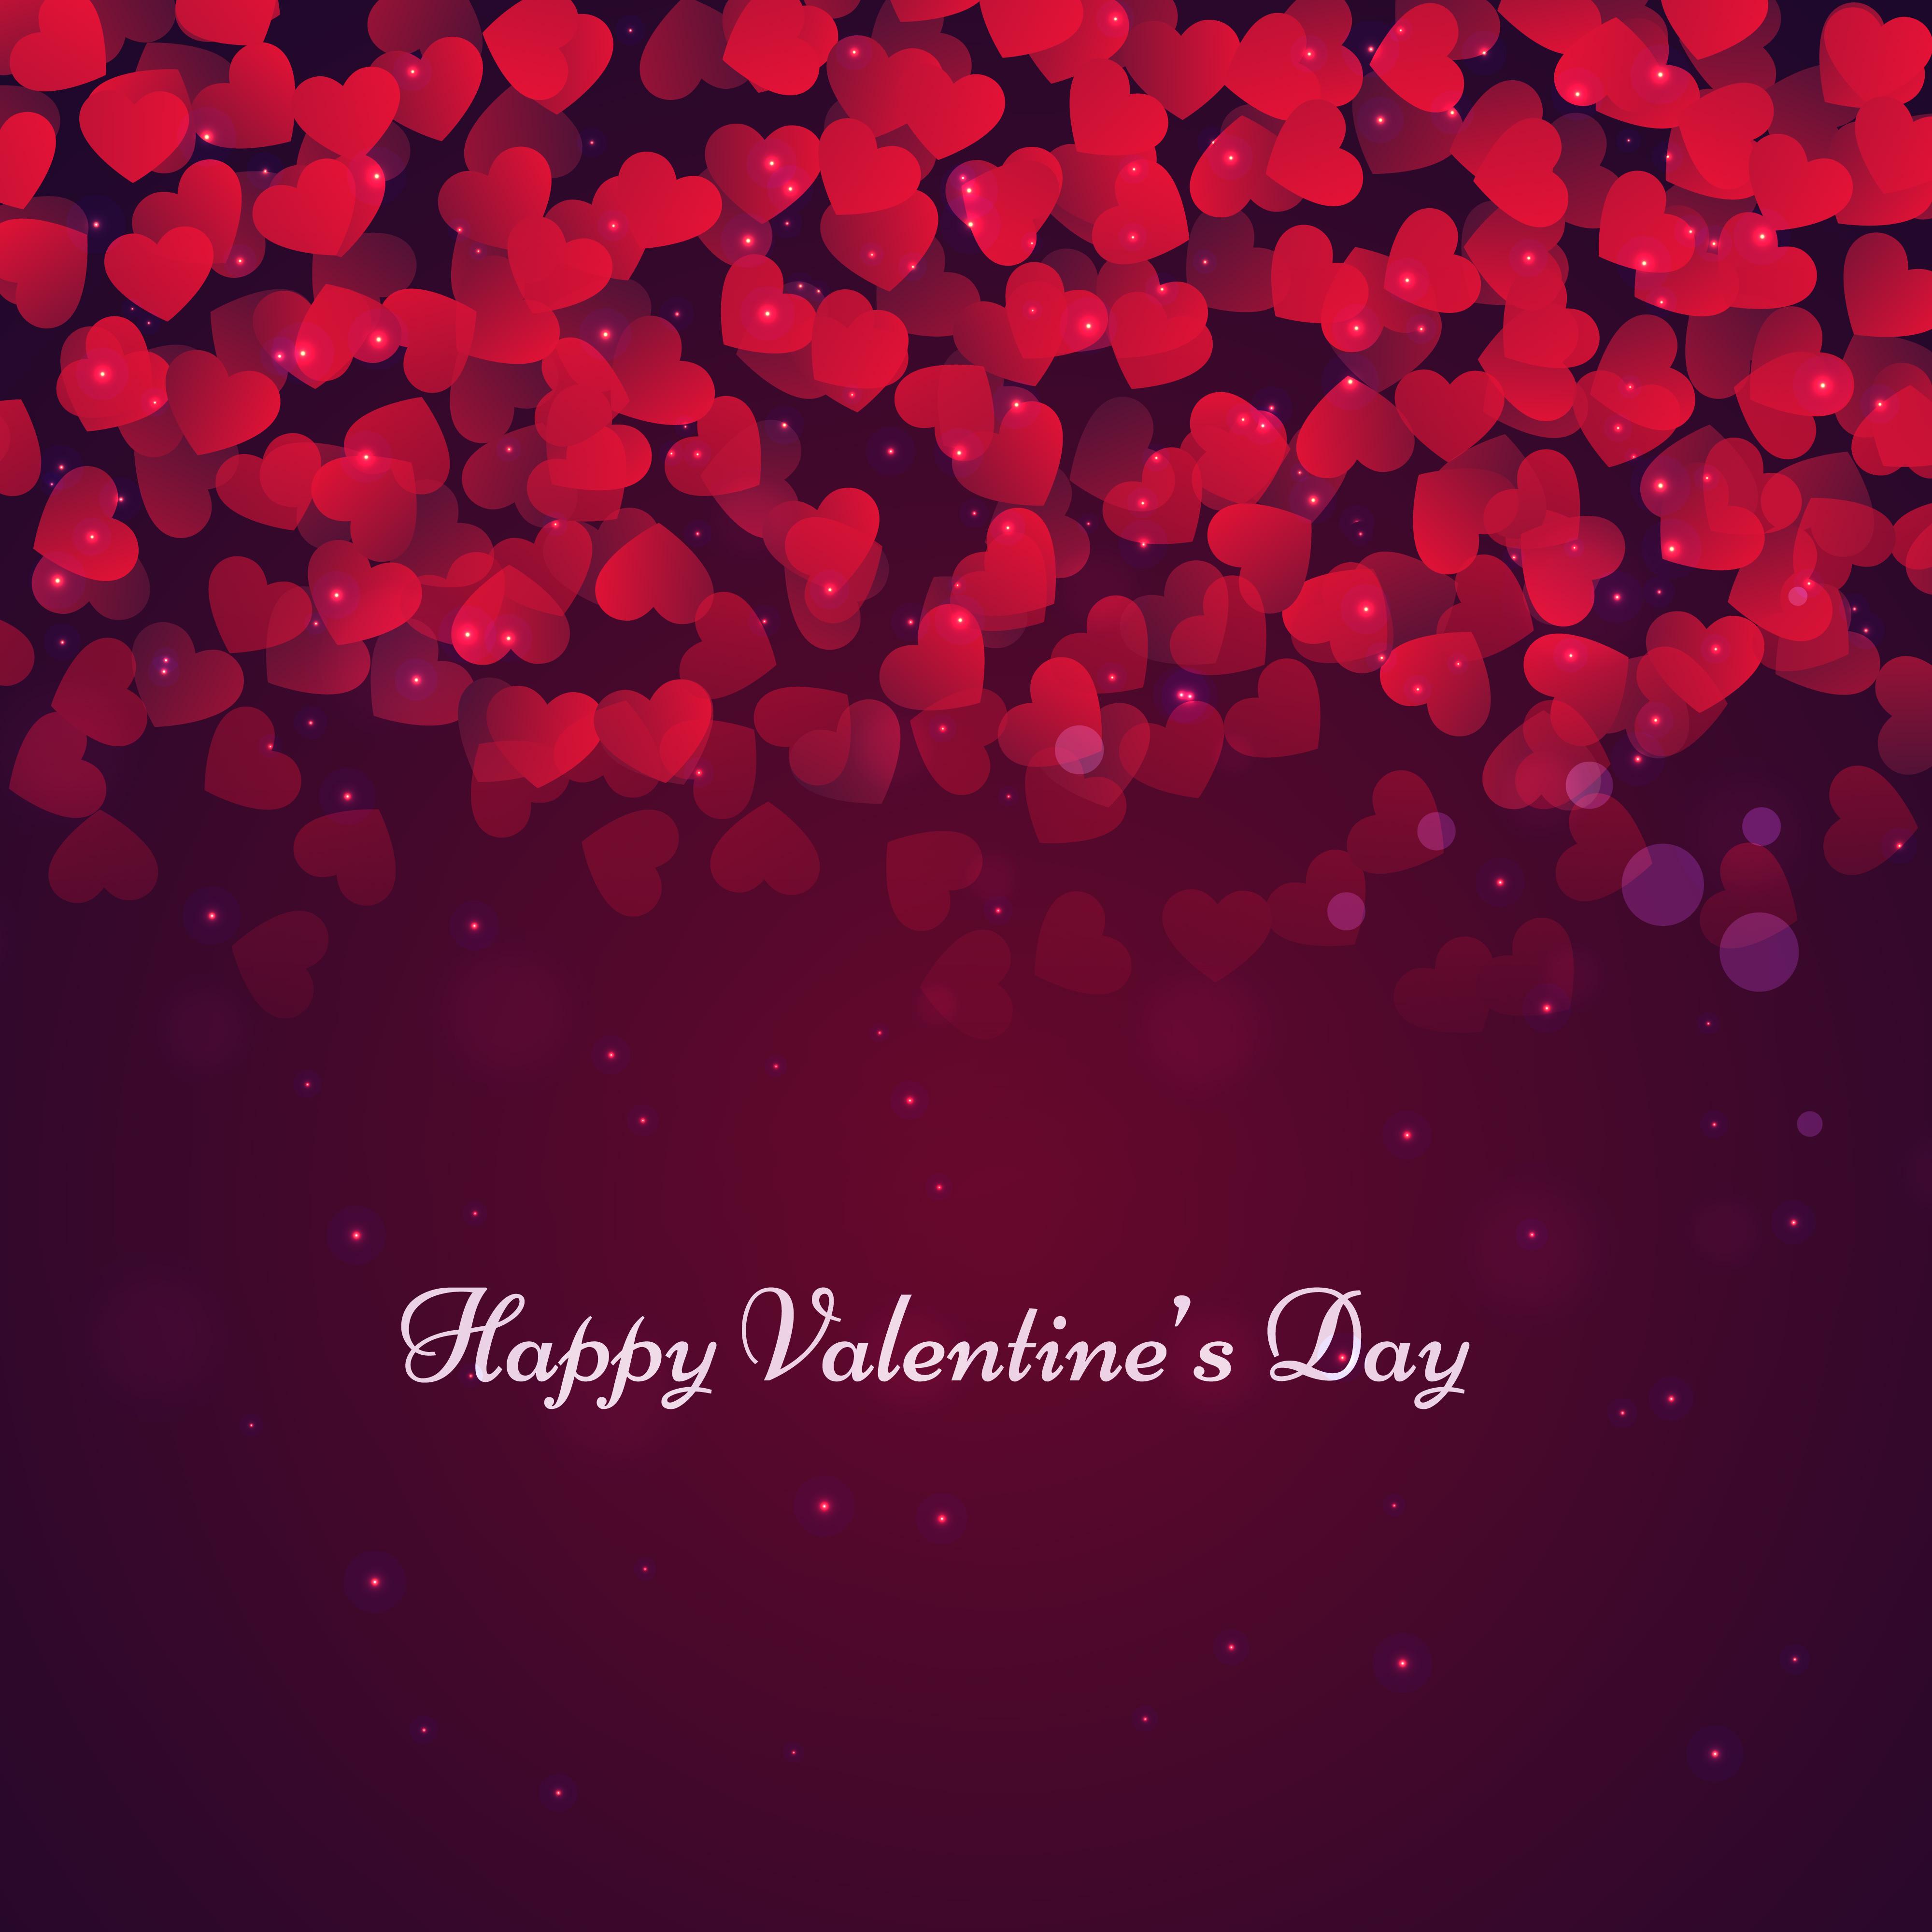 beautiful valentines day card vector design illustration